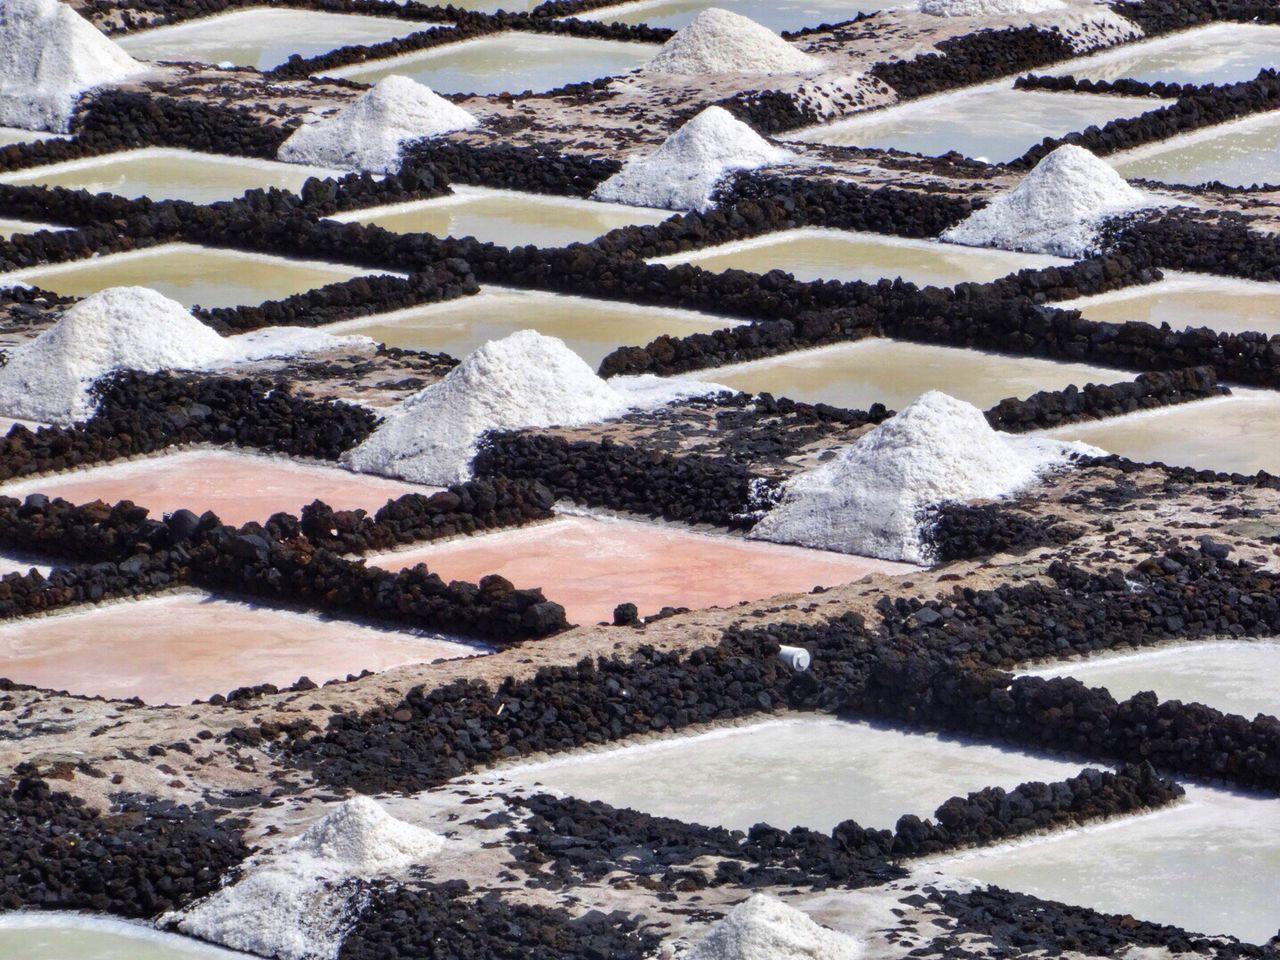 Salinen La Palma Salt Flat Salt - Mineral Salt Basin Nature No People Landscape Agriculture La Palma Canary Islands Salinas Salt SPAIN